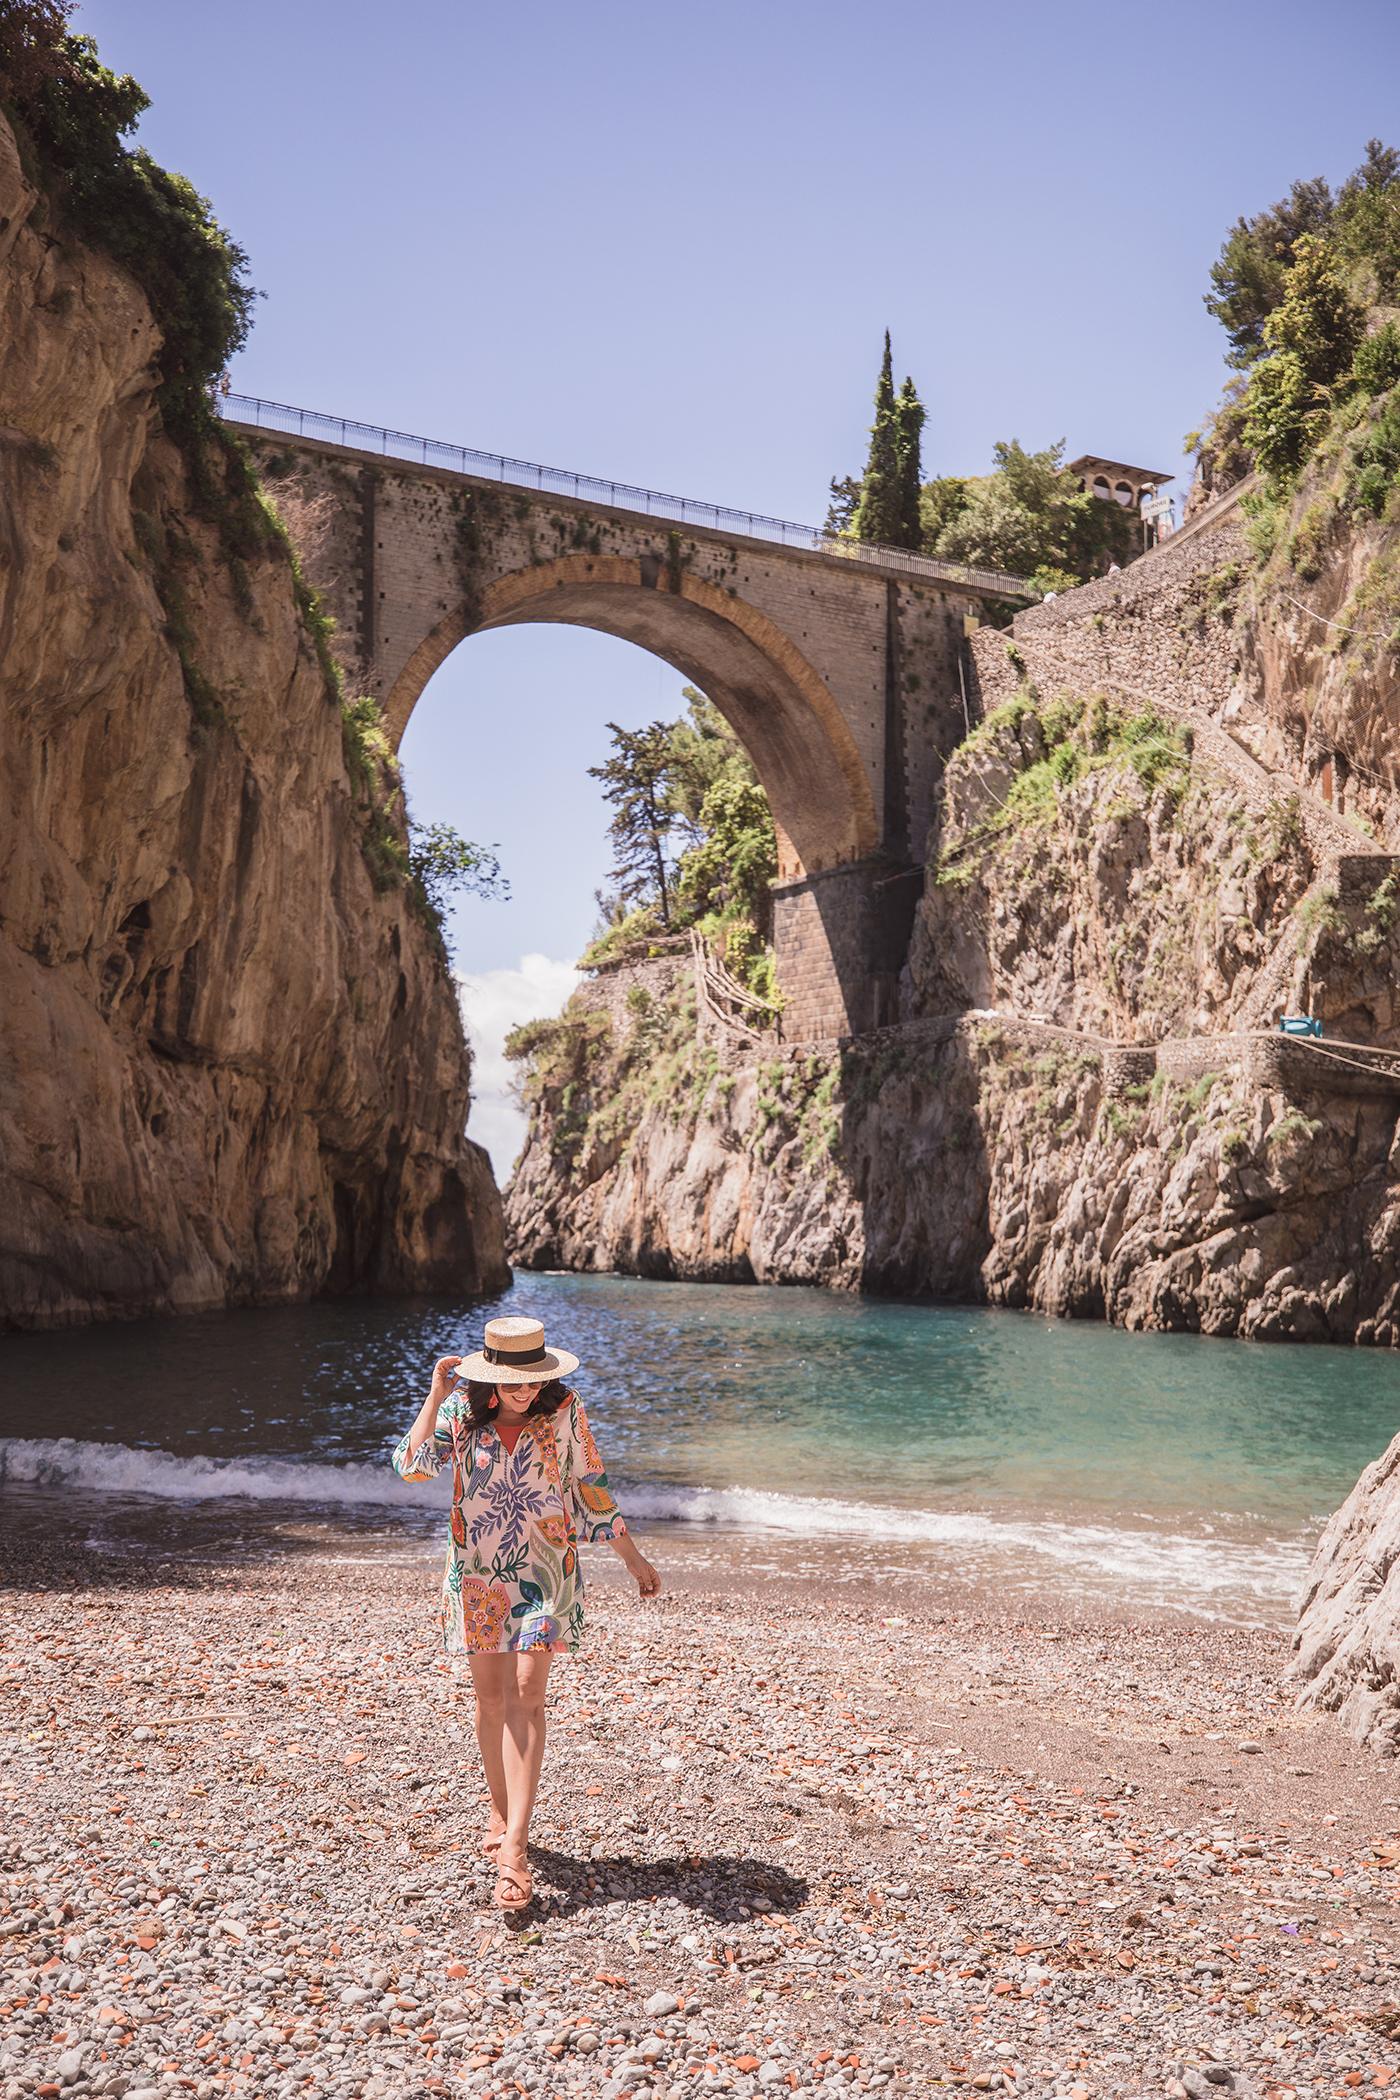 Day Tripping Along the Amalfi Coast